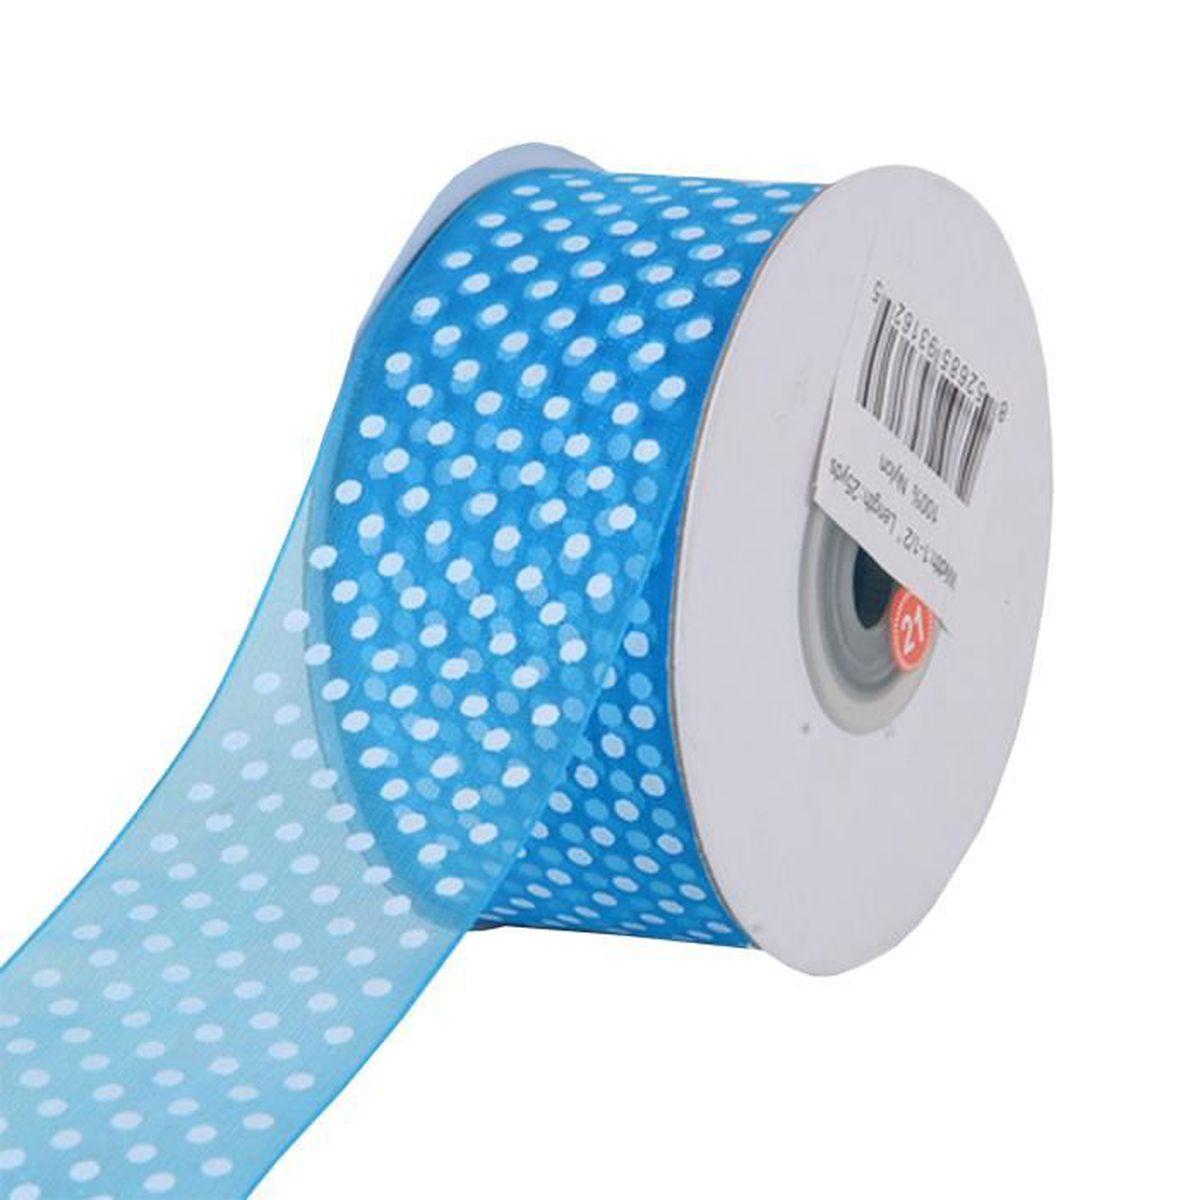 Satin bord organza ruban 10mm bobines craft décoration tissu design x 15 couleurs